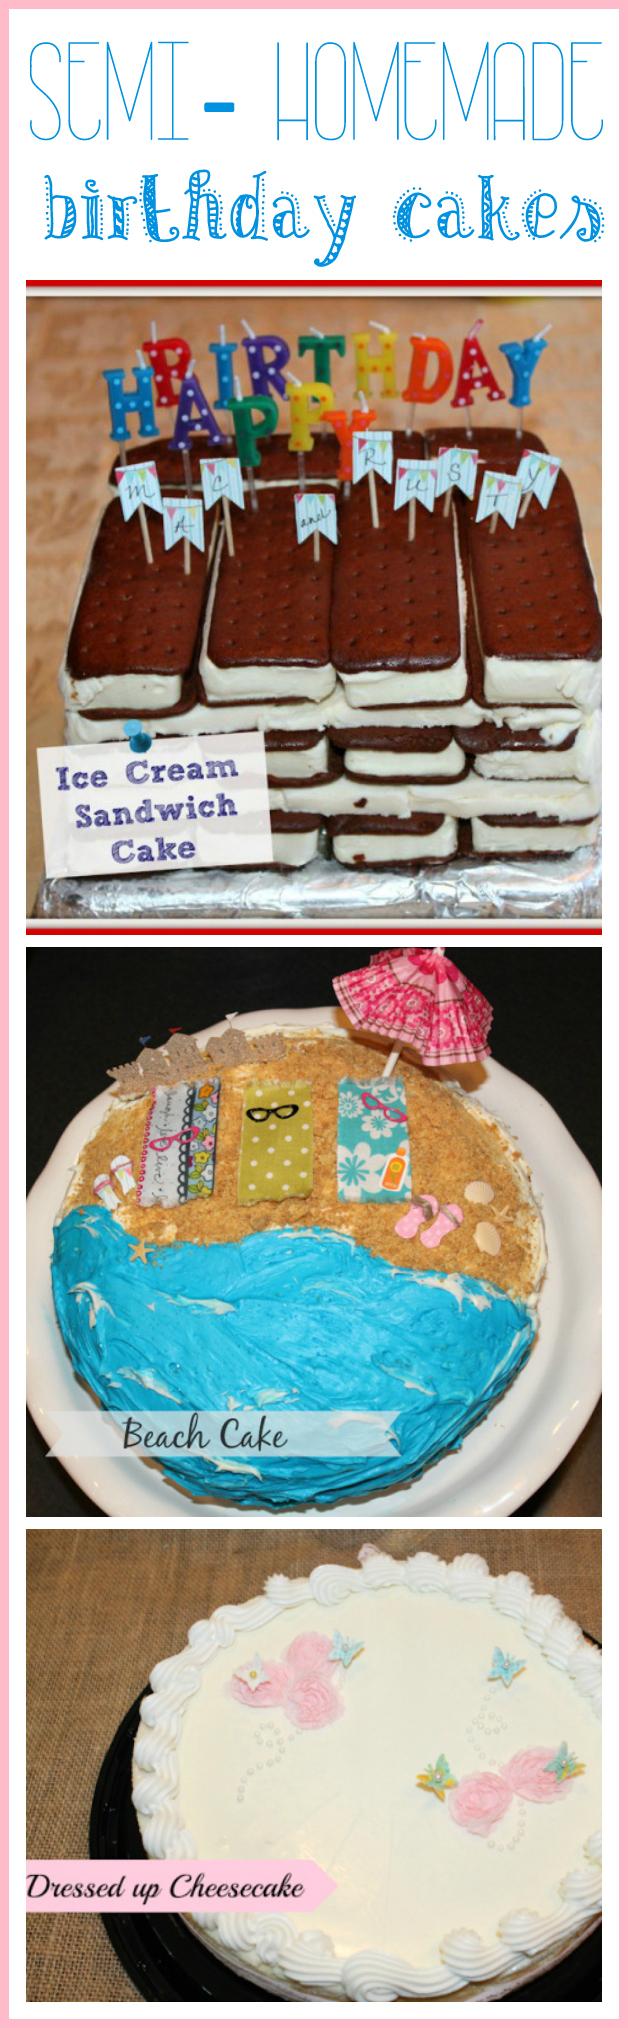 Semi-homemade birthday cake ideas - Ask Anna